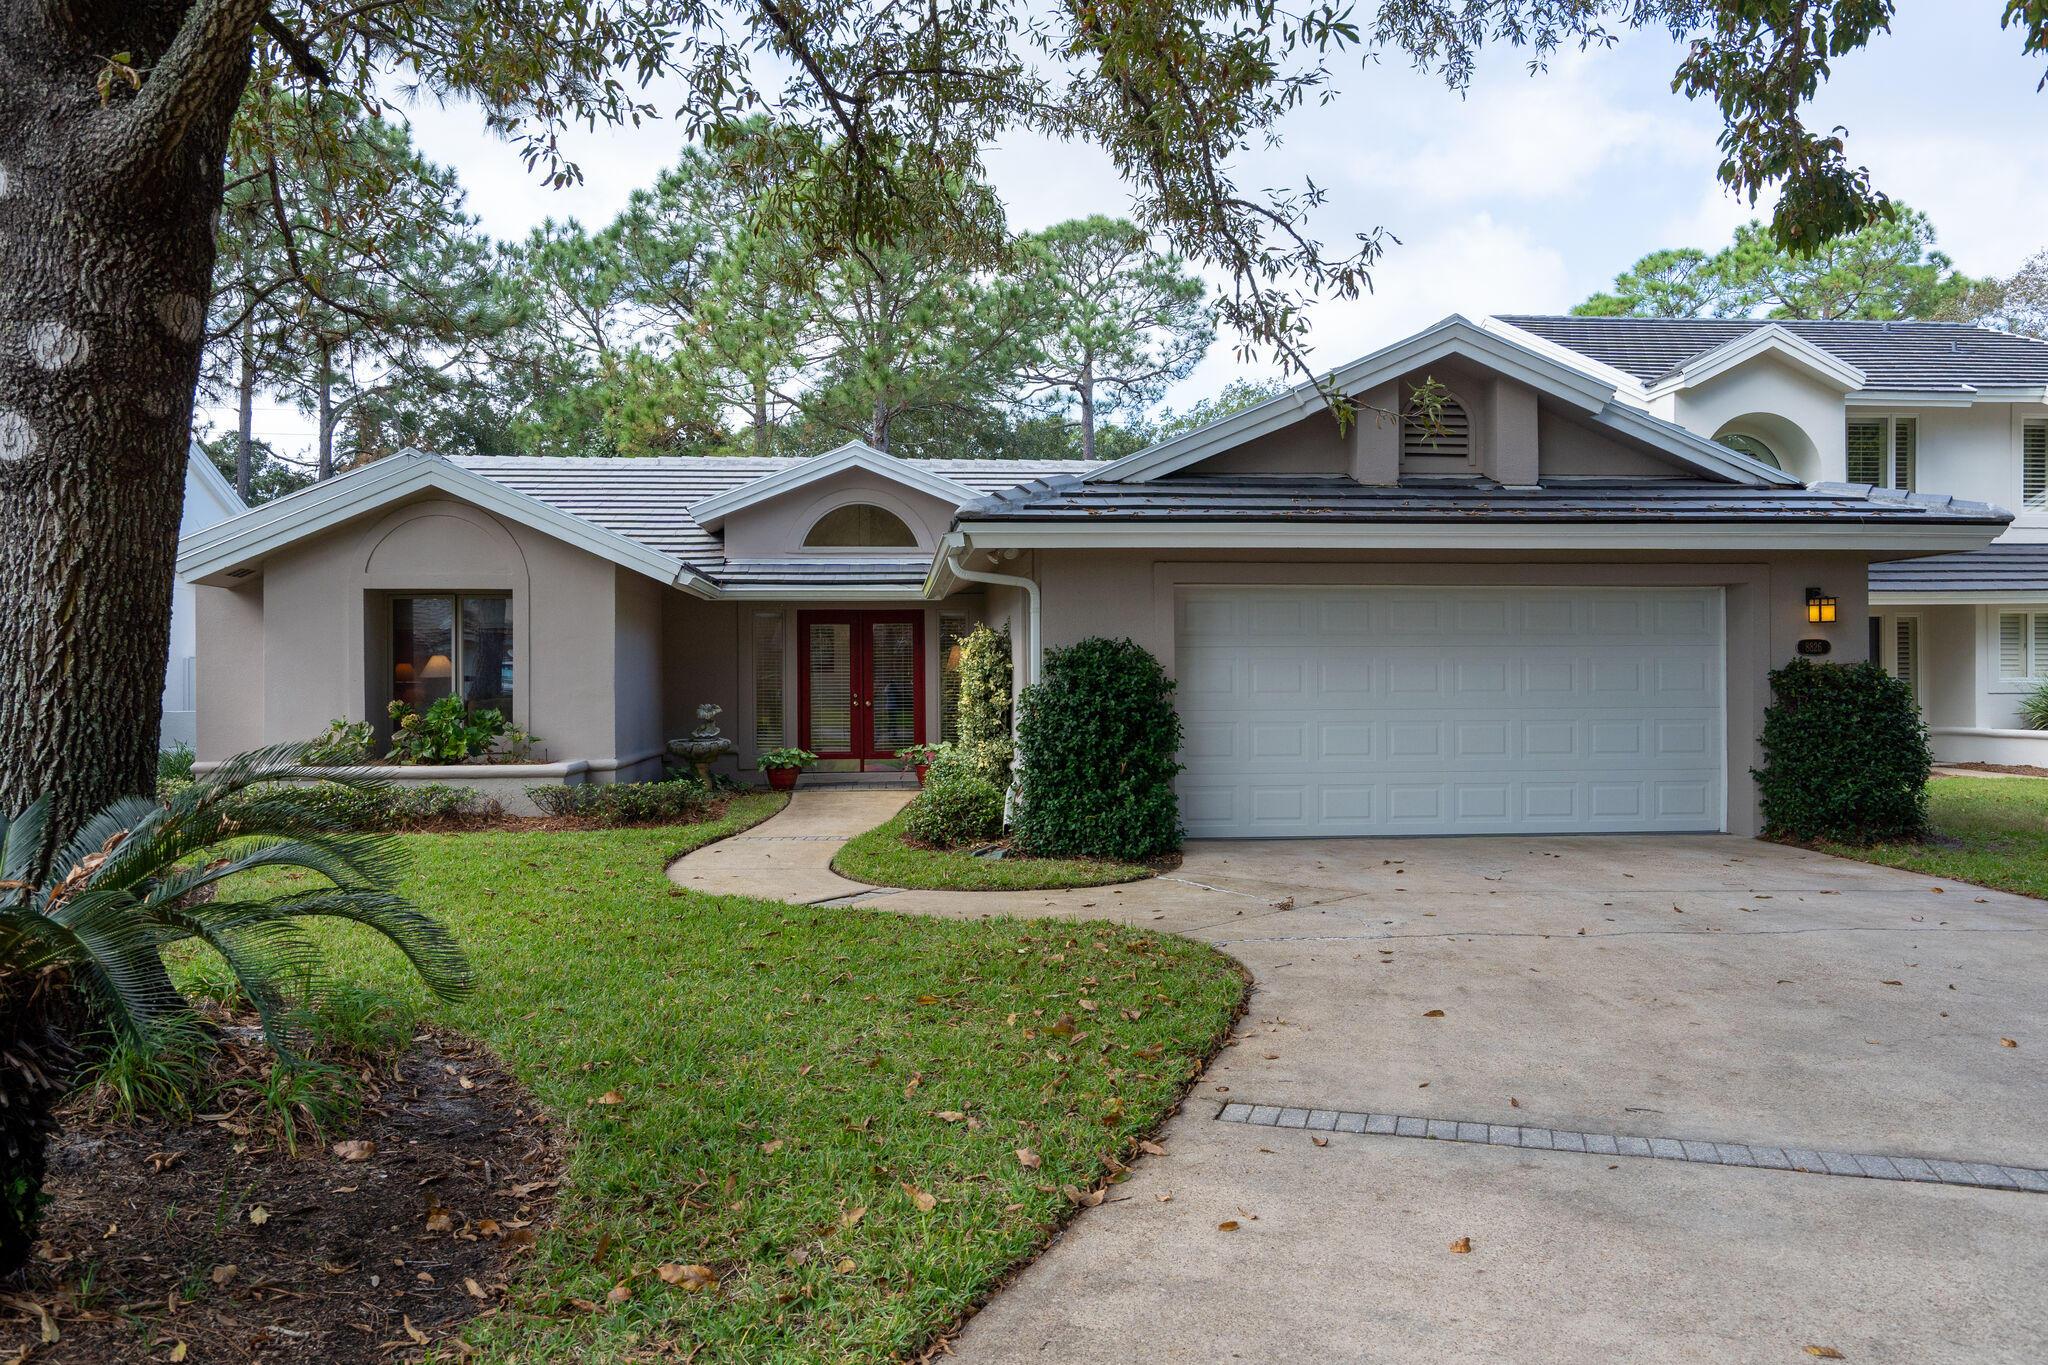 Photo of home for sale at 8826 Saint Andrews, Miramar Beach FL